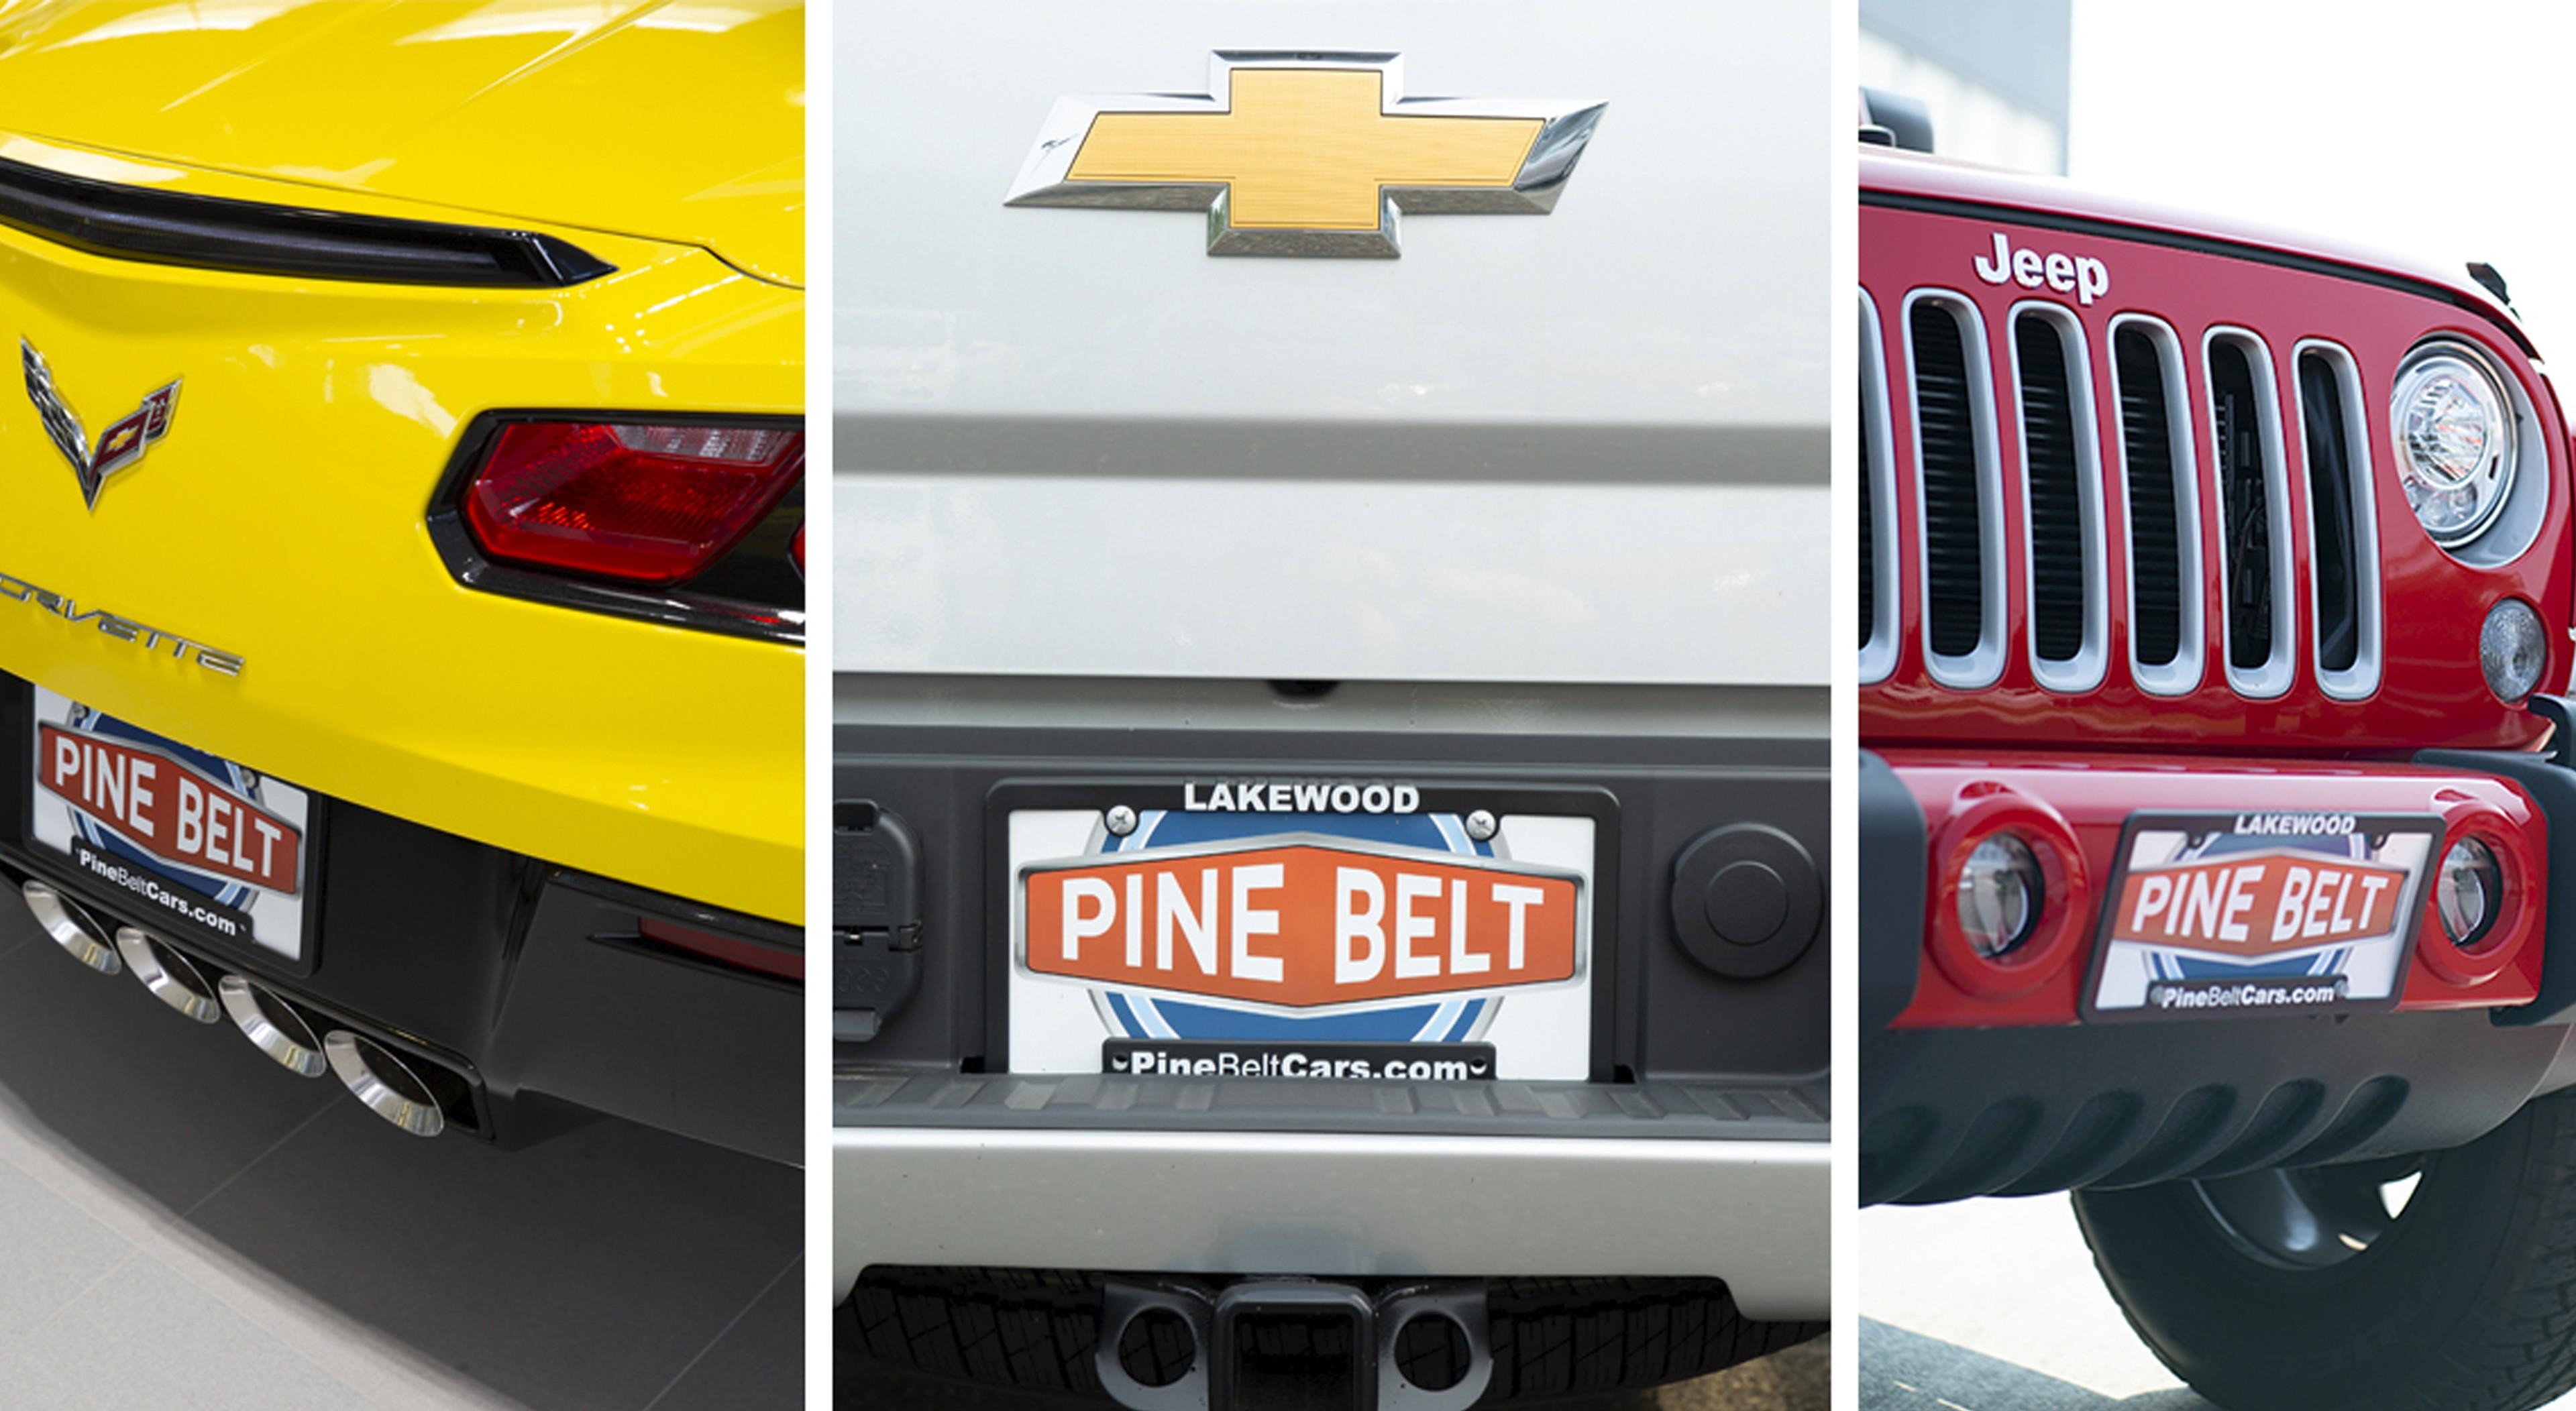 Pine Belt Jeep >> Pine Belt Enterprises Inc Linkedin